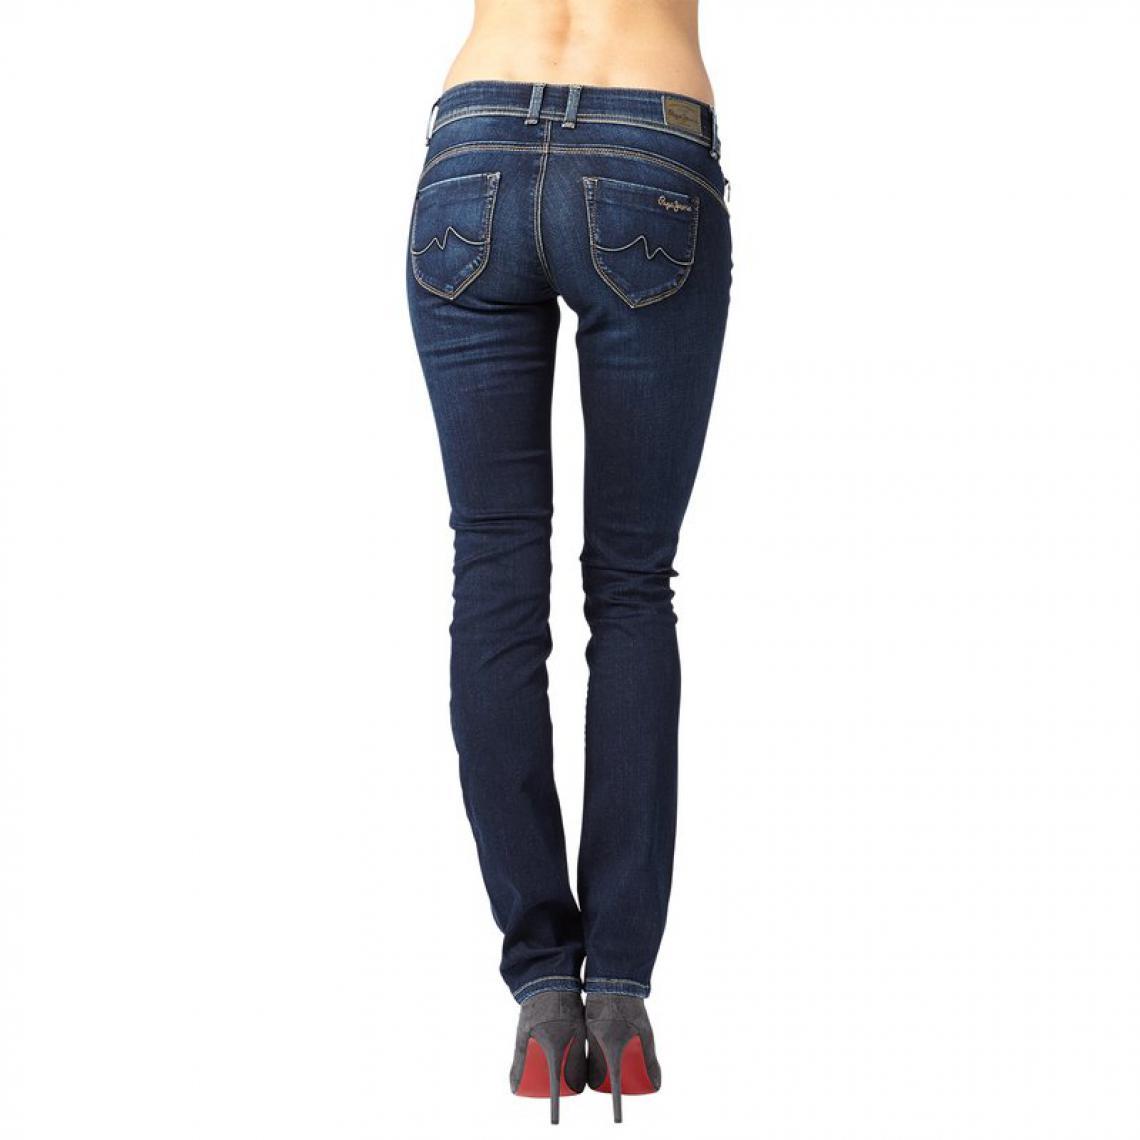 3c11f639294 Jean slim longueur US 32 femme New Brooke Pepe Jeans - Bleu